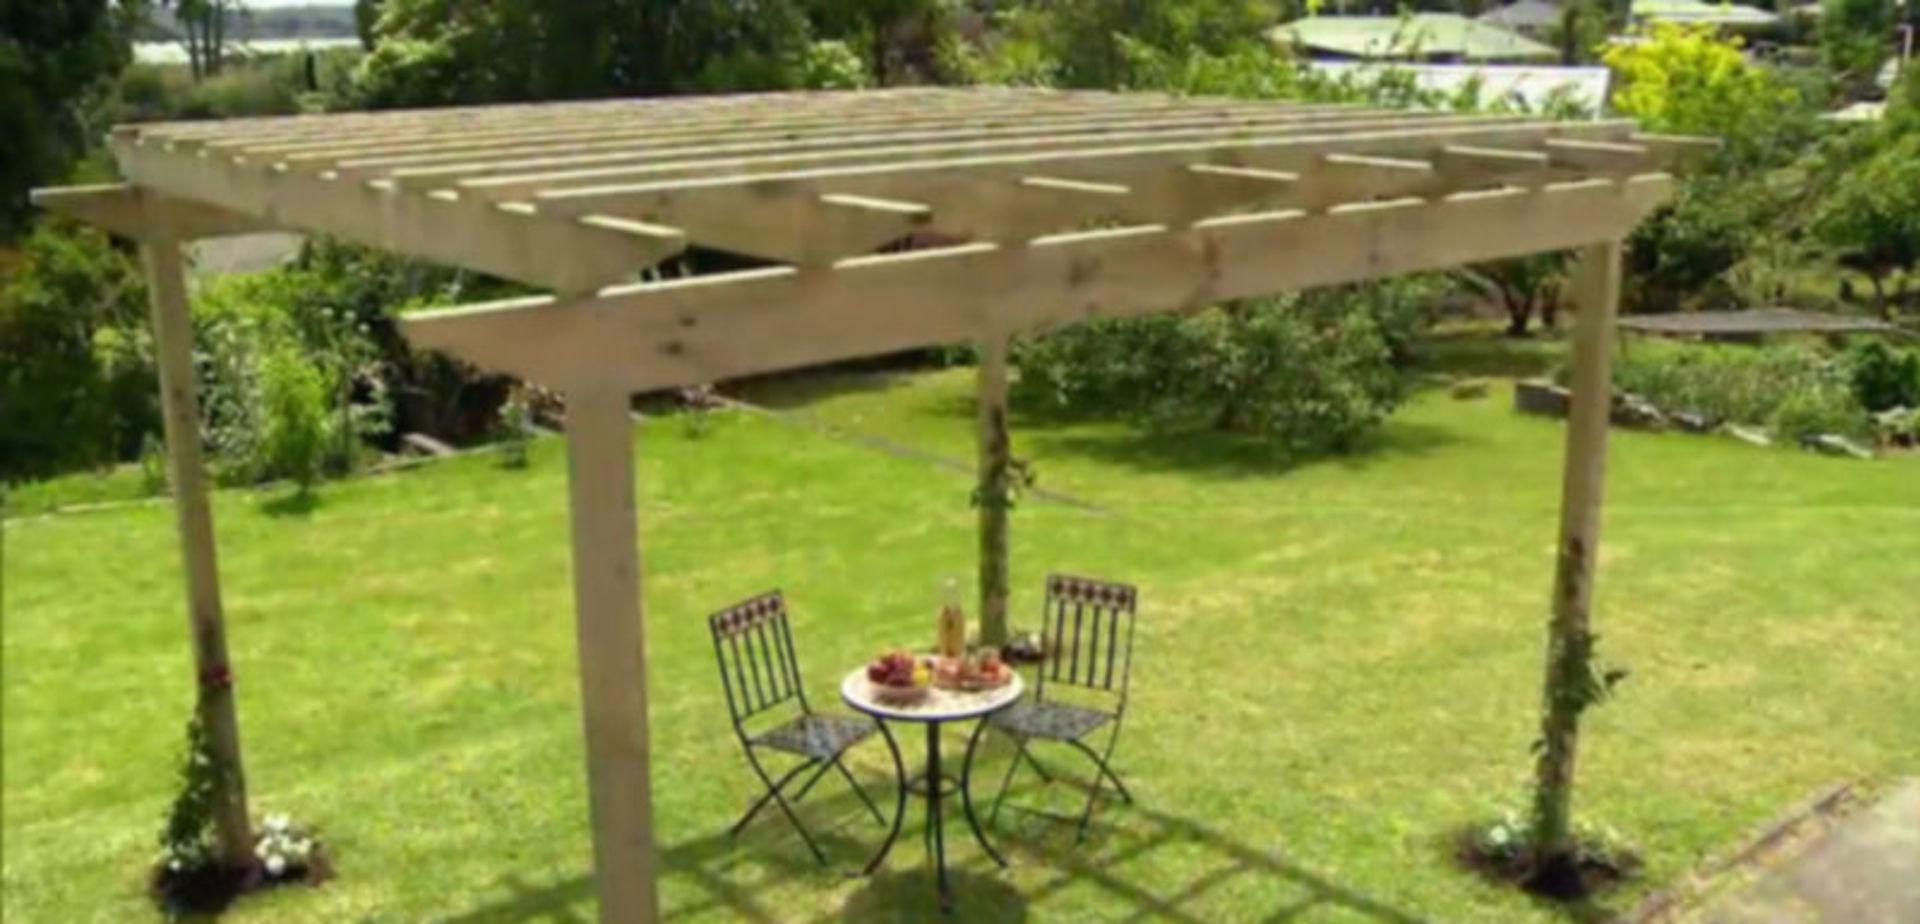 Een pergola bouwen in 9 stappen - Bedekt hout pergola ...